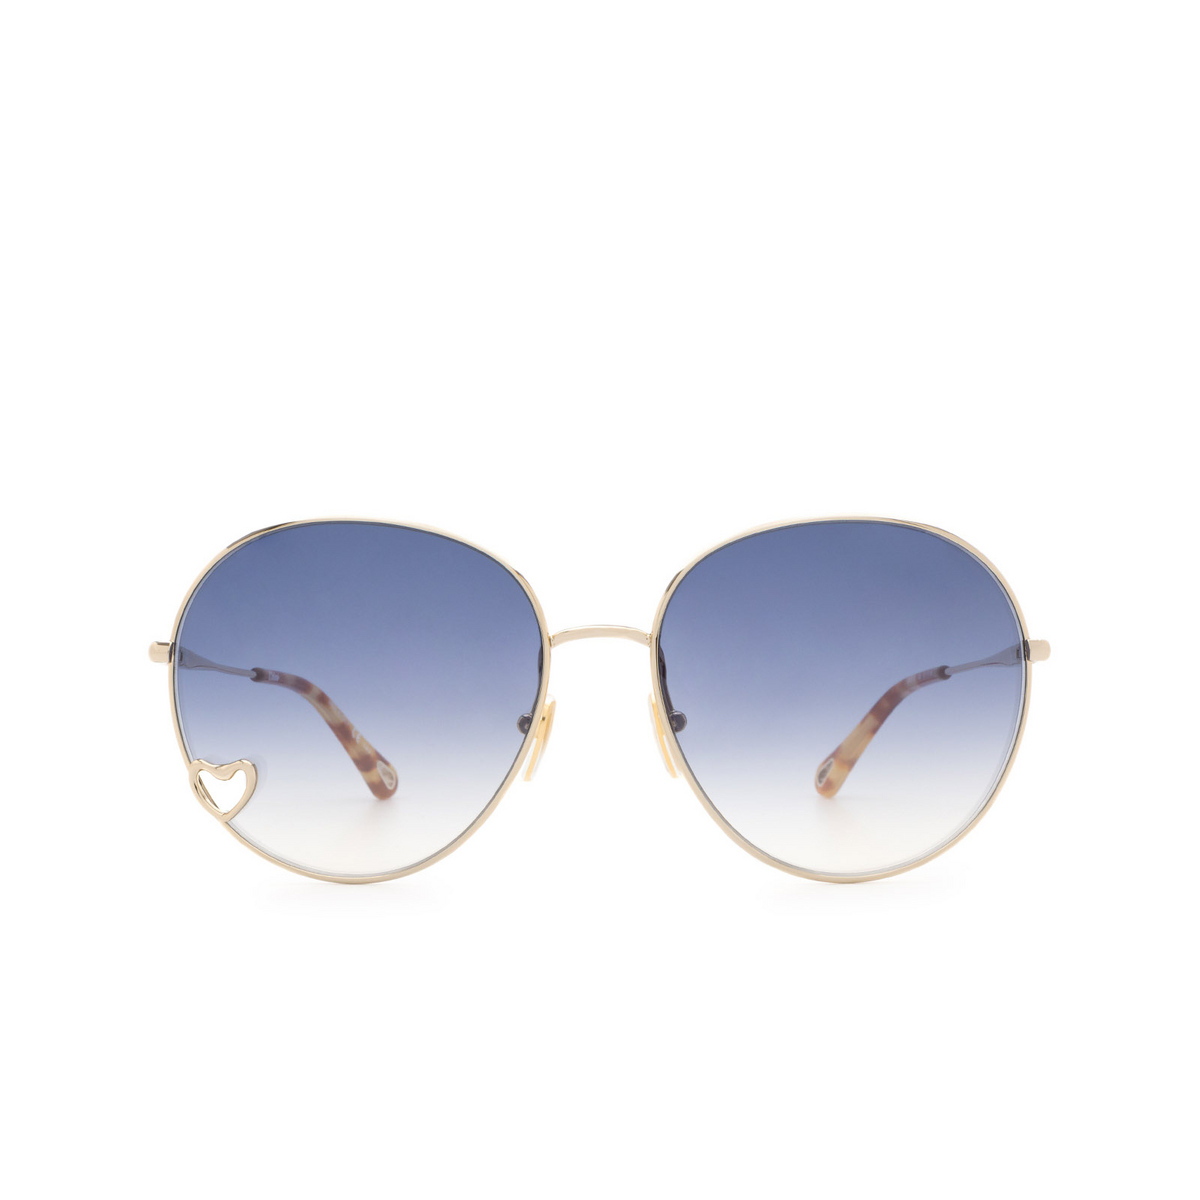 Chloé ® Round Sunglasses: CH0027S color Gold 002.